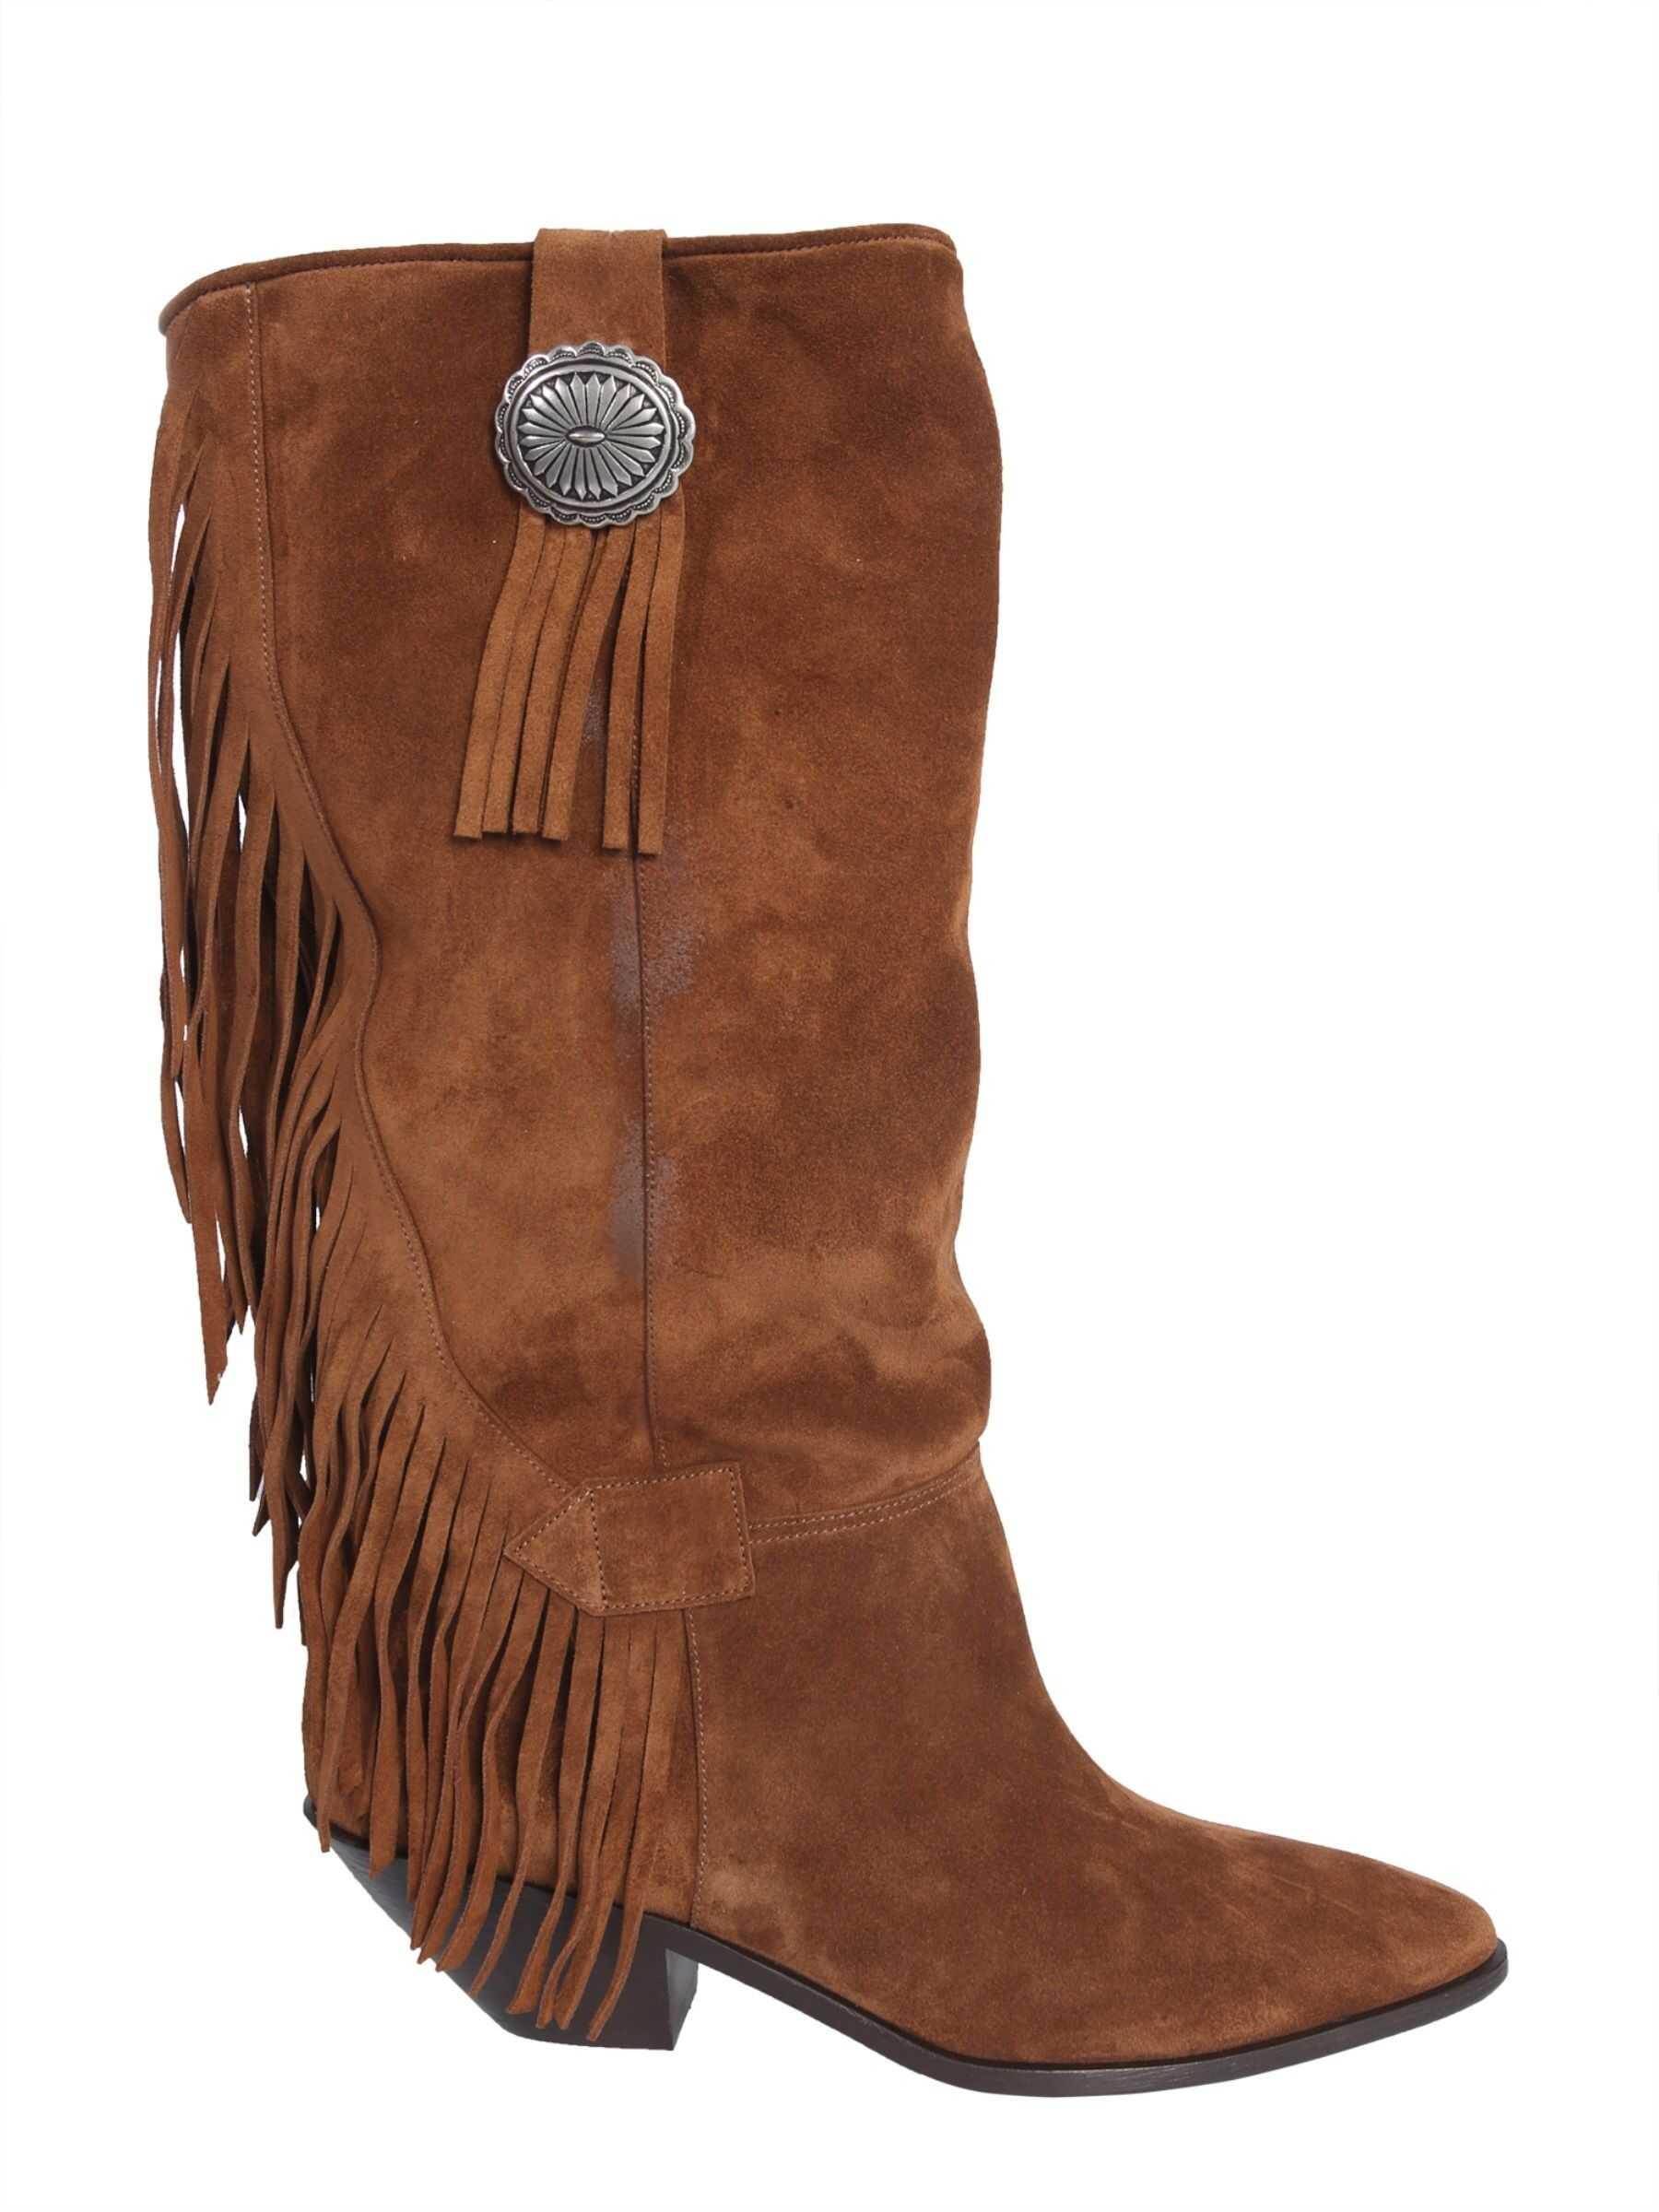 Saint Laurent Texano High Boots 552656_0RN002529 BROWN imagine b-mall.ro